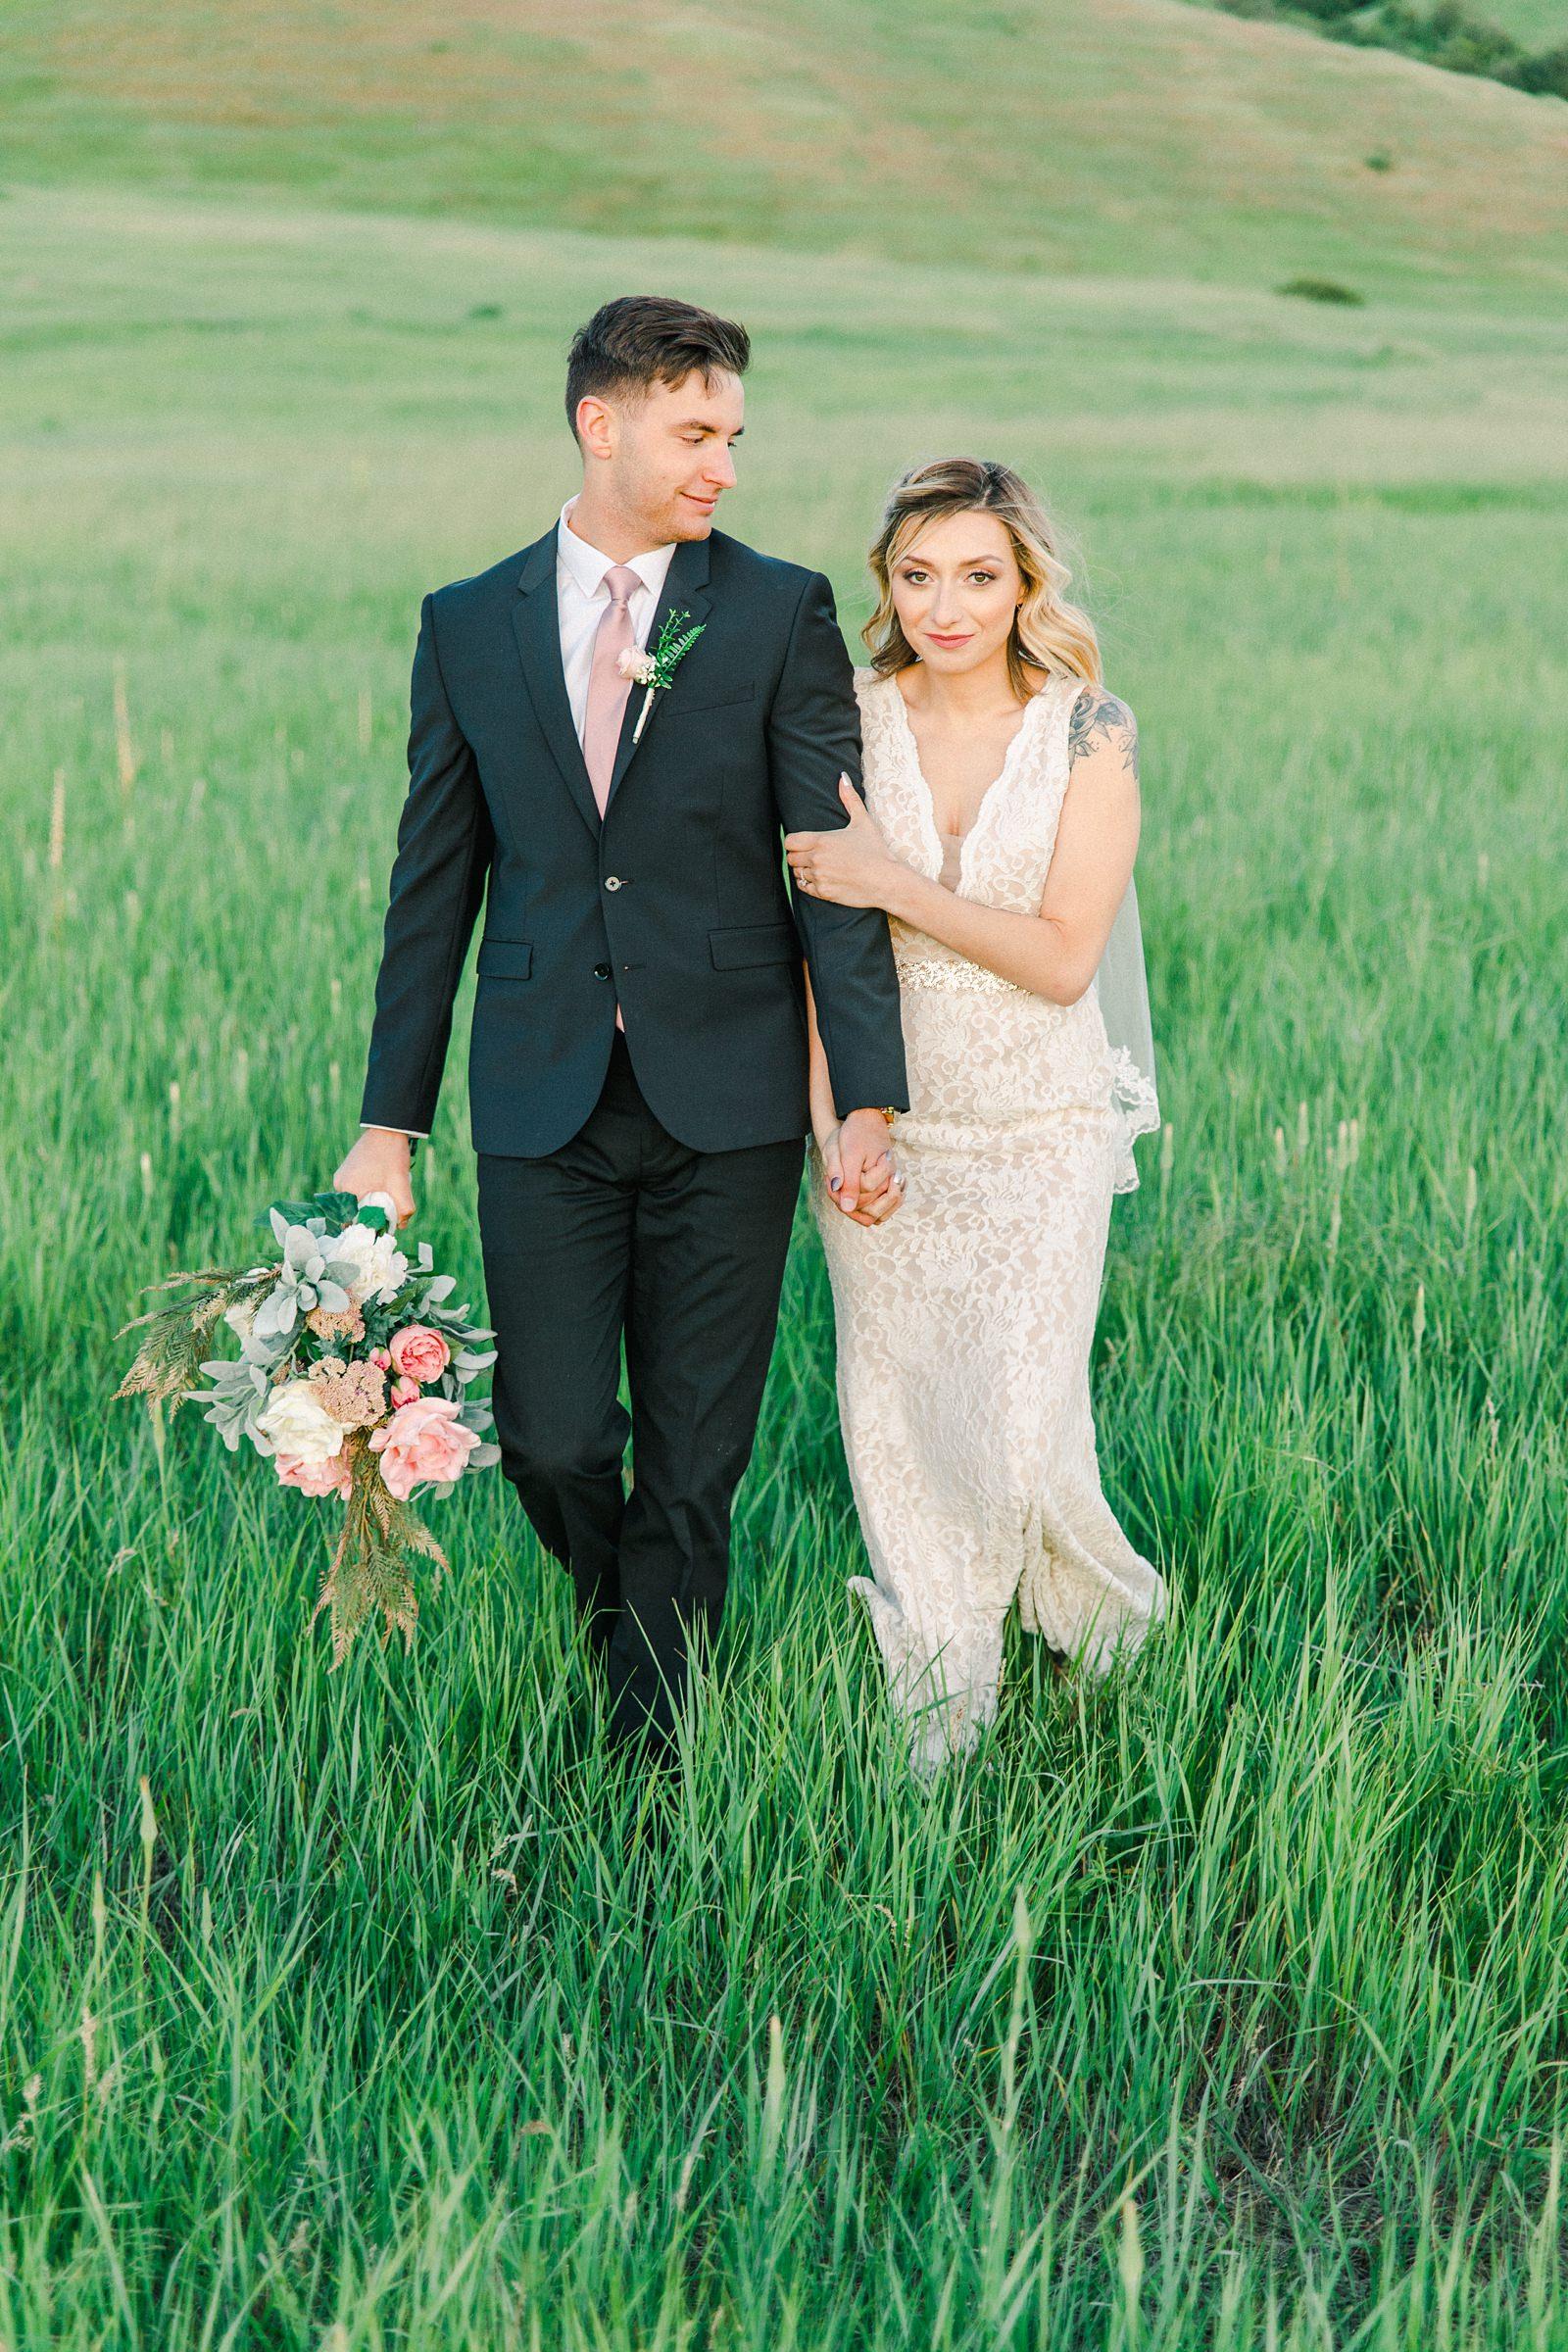 Salt Lake City Utah Bridal Wedding Photography, Tunnel Springs Park, bride and groom in open green field